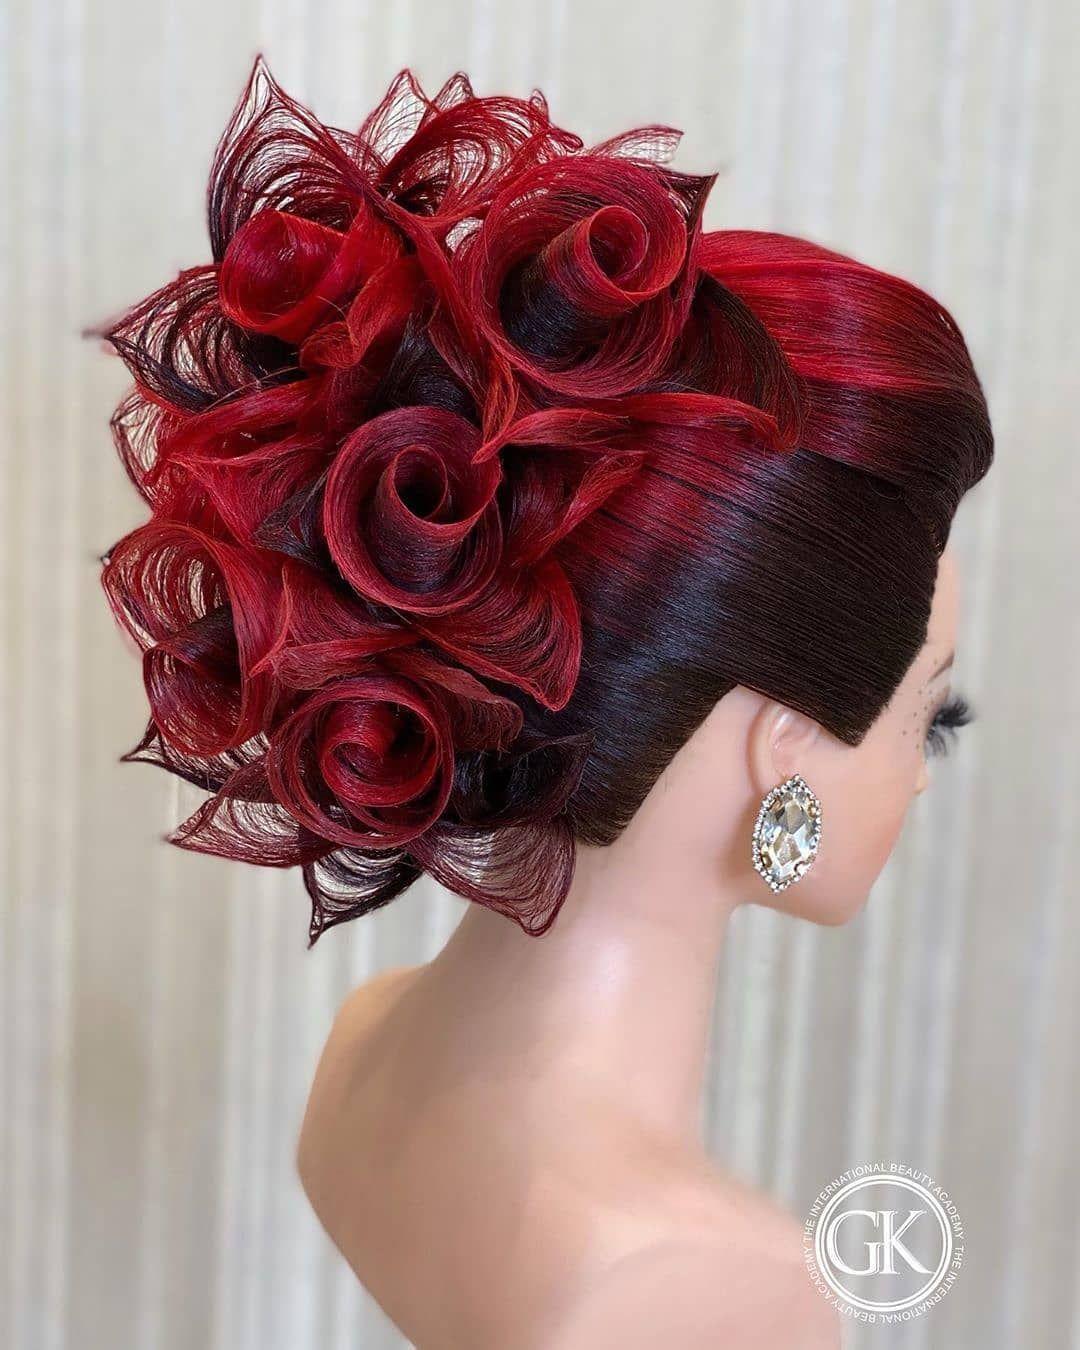 The Best Idea On Instagram Creativehair Haireducation Haircut Hair Hairdo Hairdressing Hairdr In 2020 Competition Hair Black Red Hair Hair Magazine